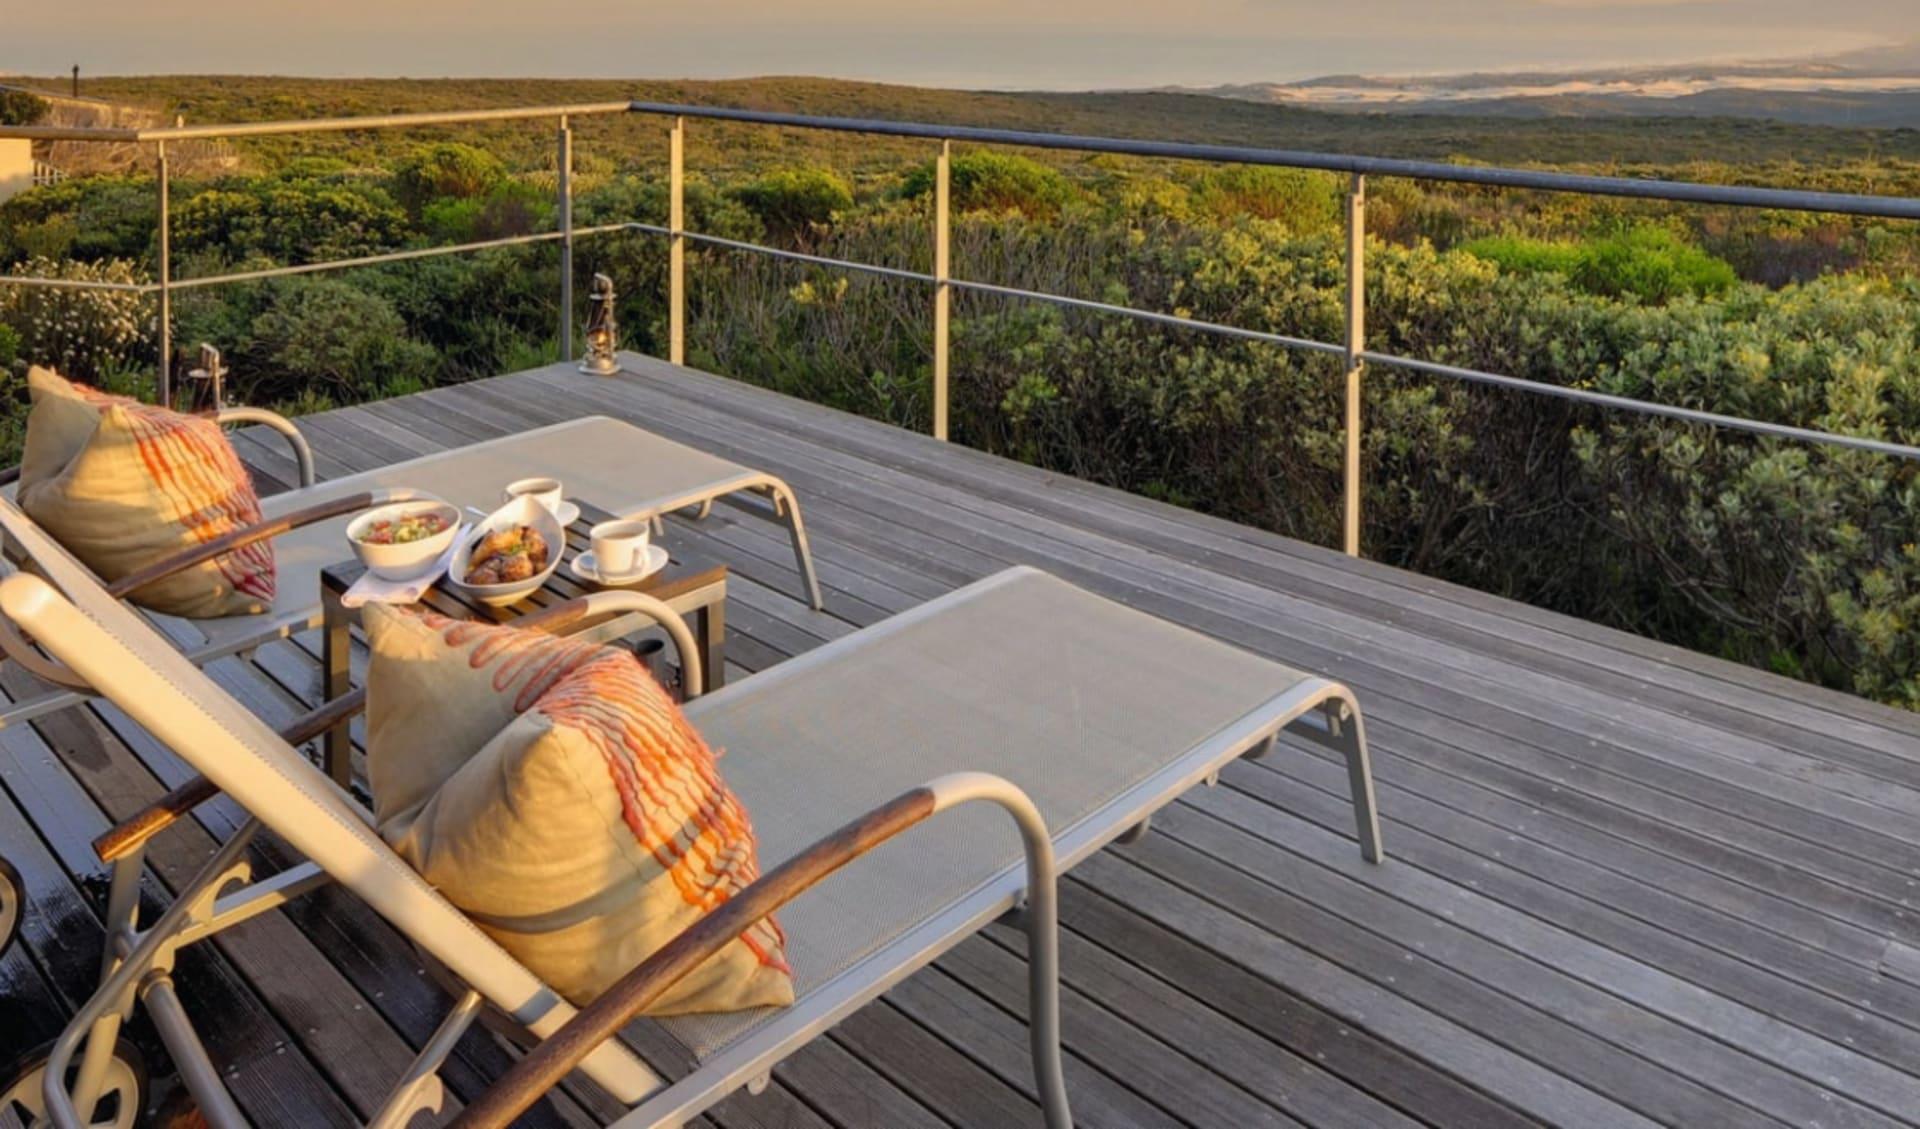 4 C's (Commerce, Conservation, Community & Culture) ab Kapstadt: Exterior Grootbos Private Nature Reserve Terrasse der Forest Lodge mit Liegestühle